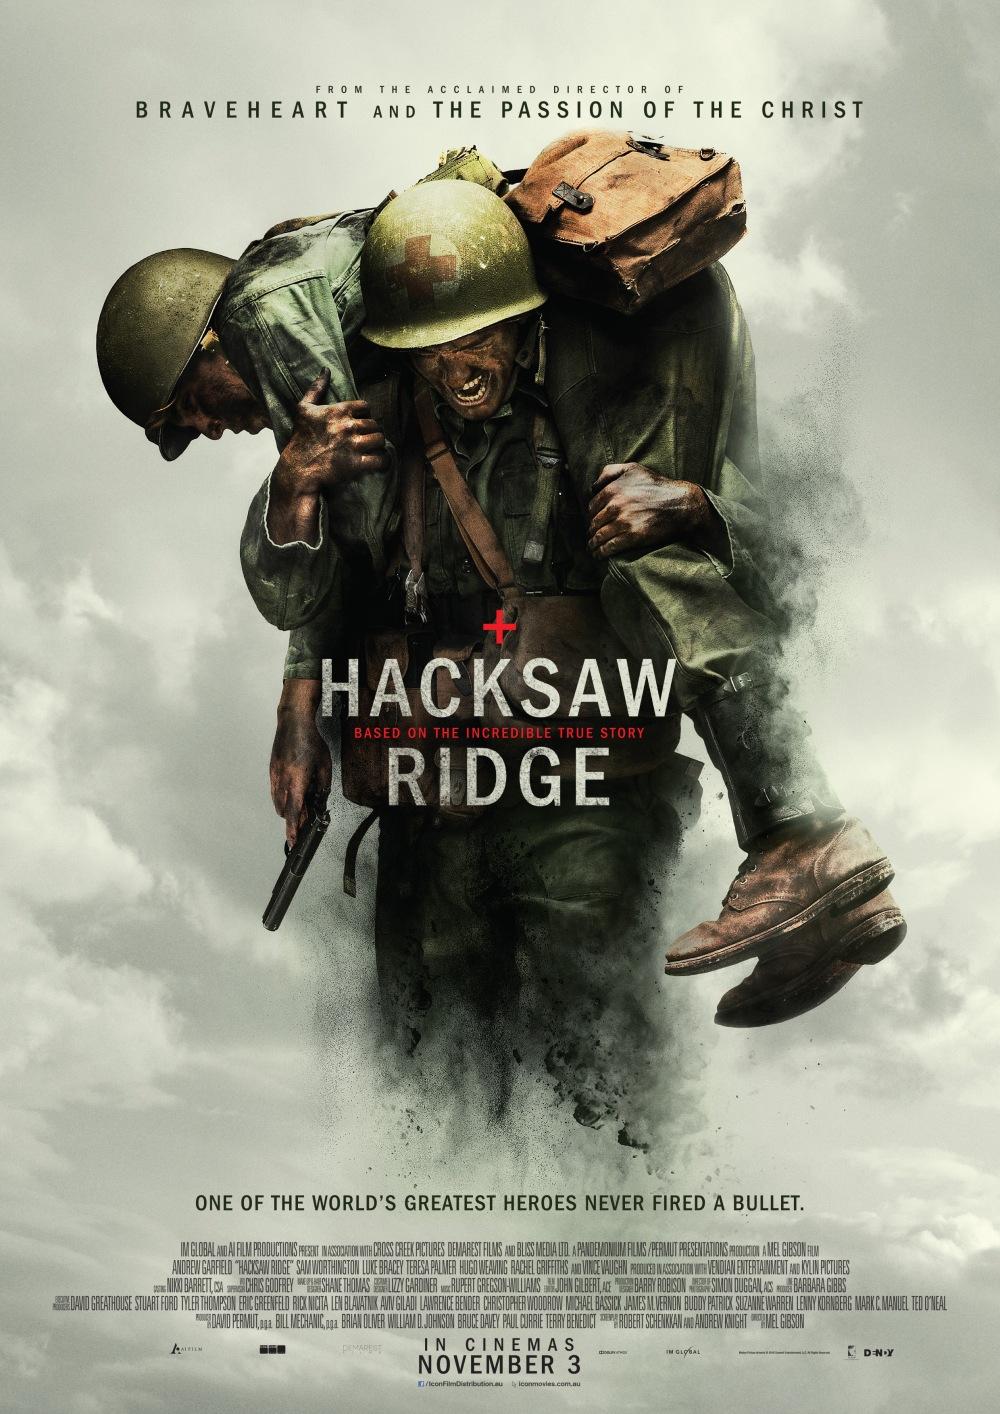 IFD_Hacksaw_Ridge_A4.jpg